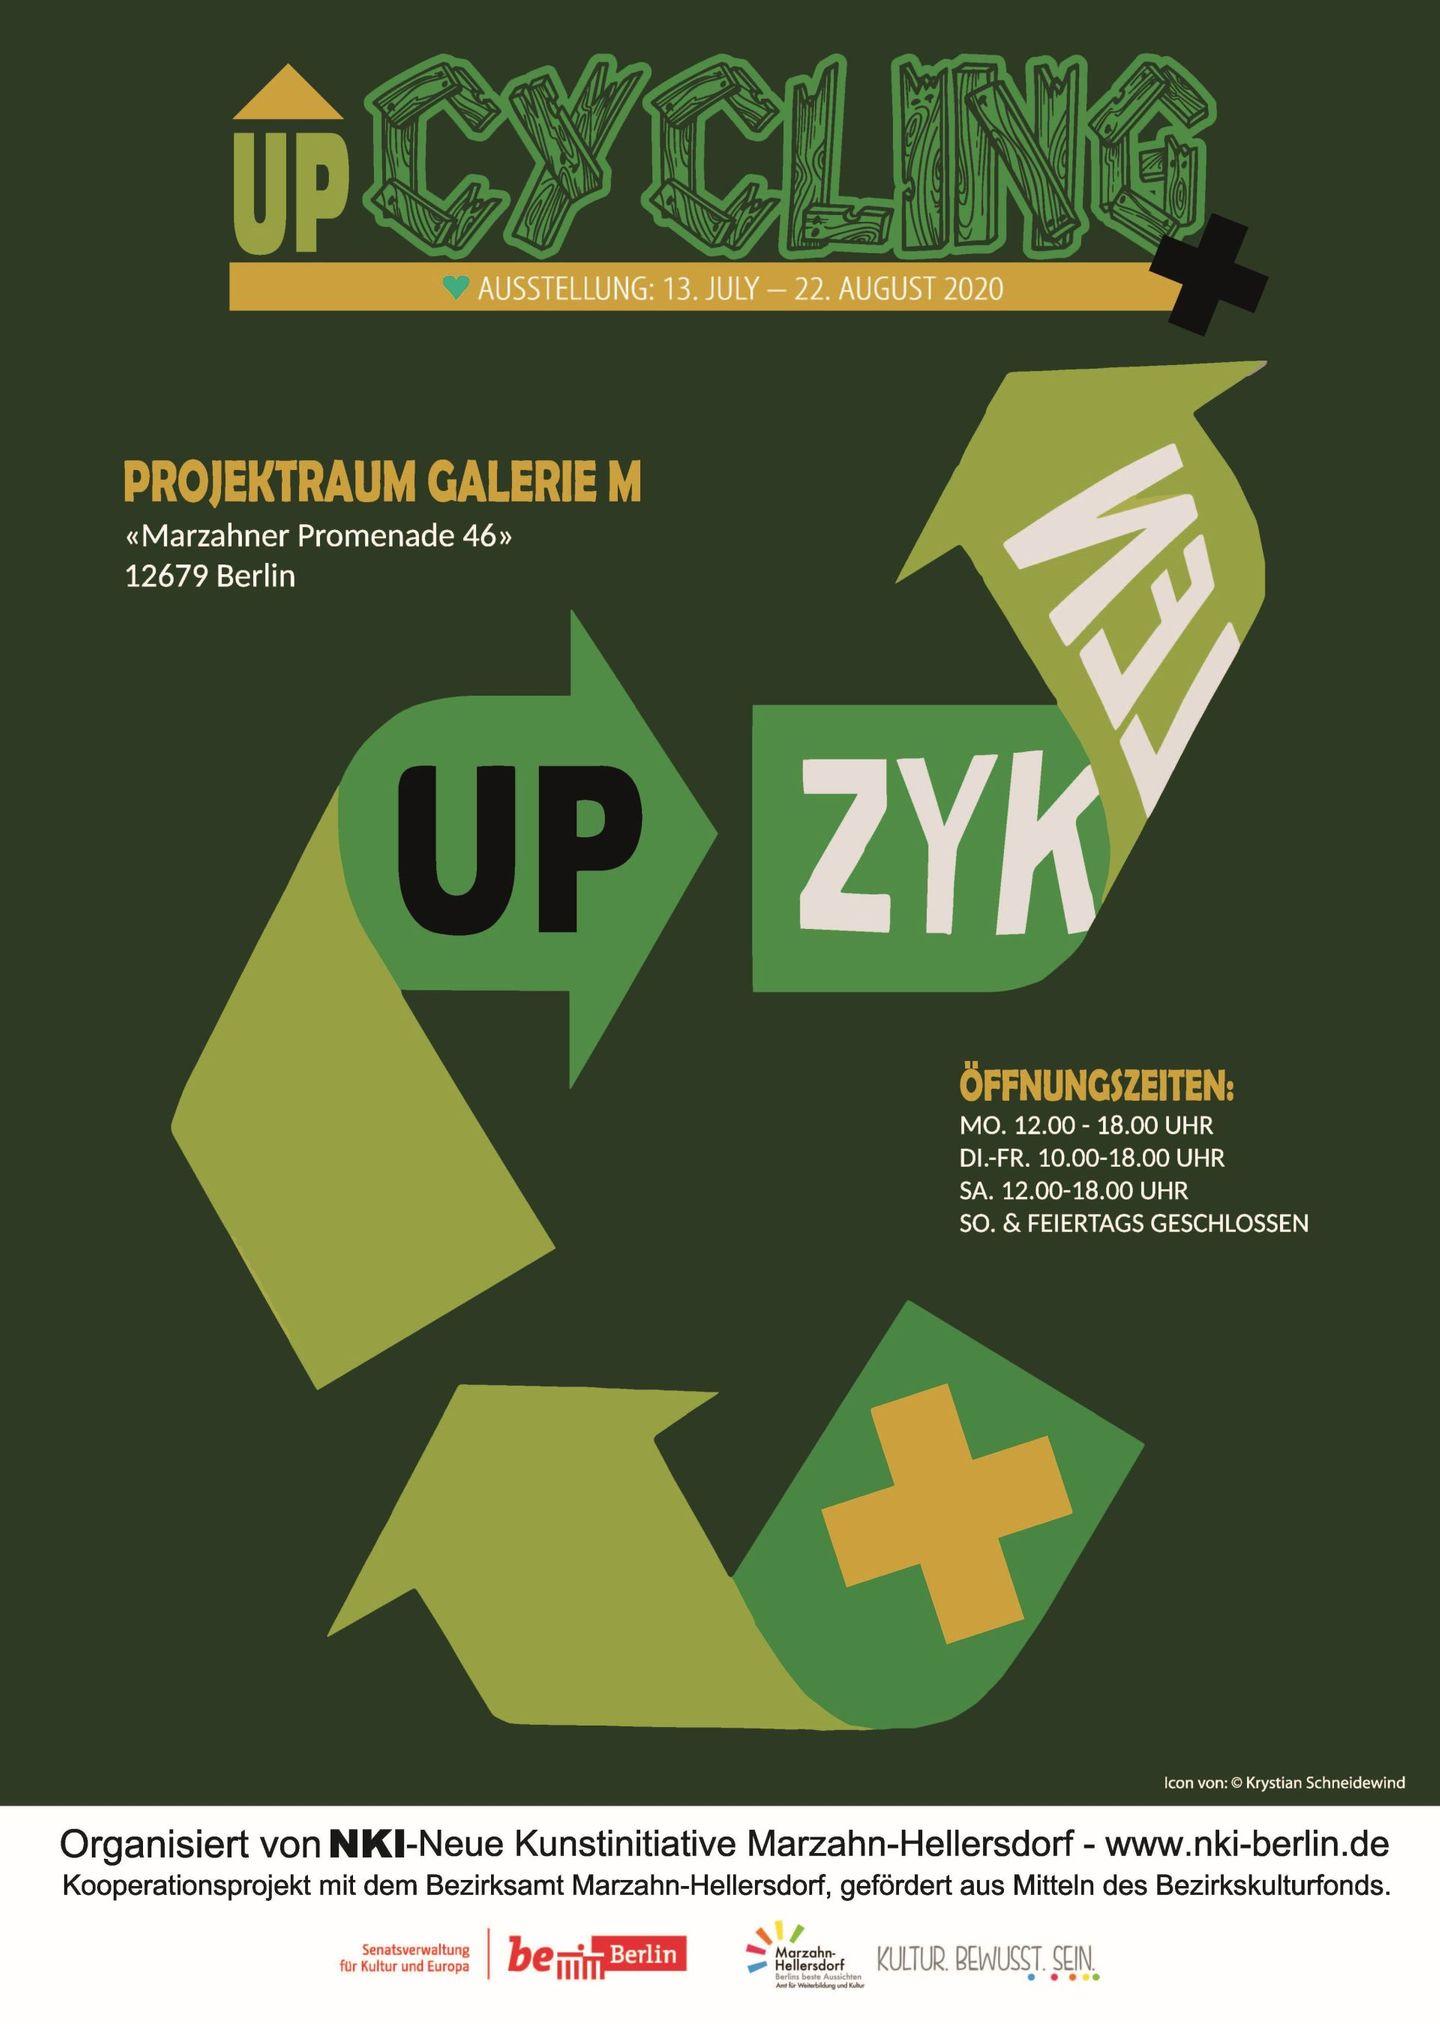 Fr/Sa: Ausstellung zum Thema Upycling-Kunst im Projektraum Galerie M